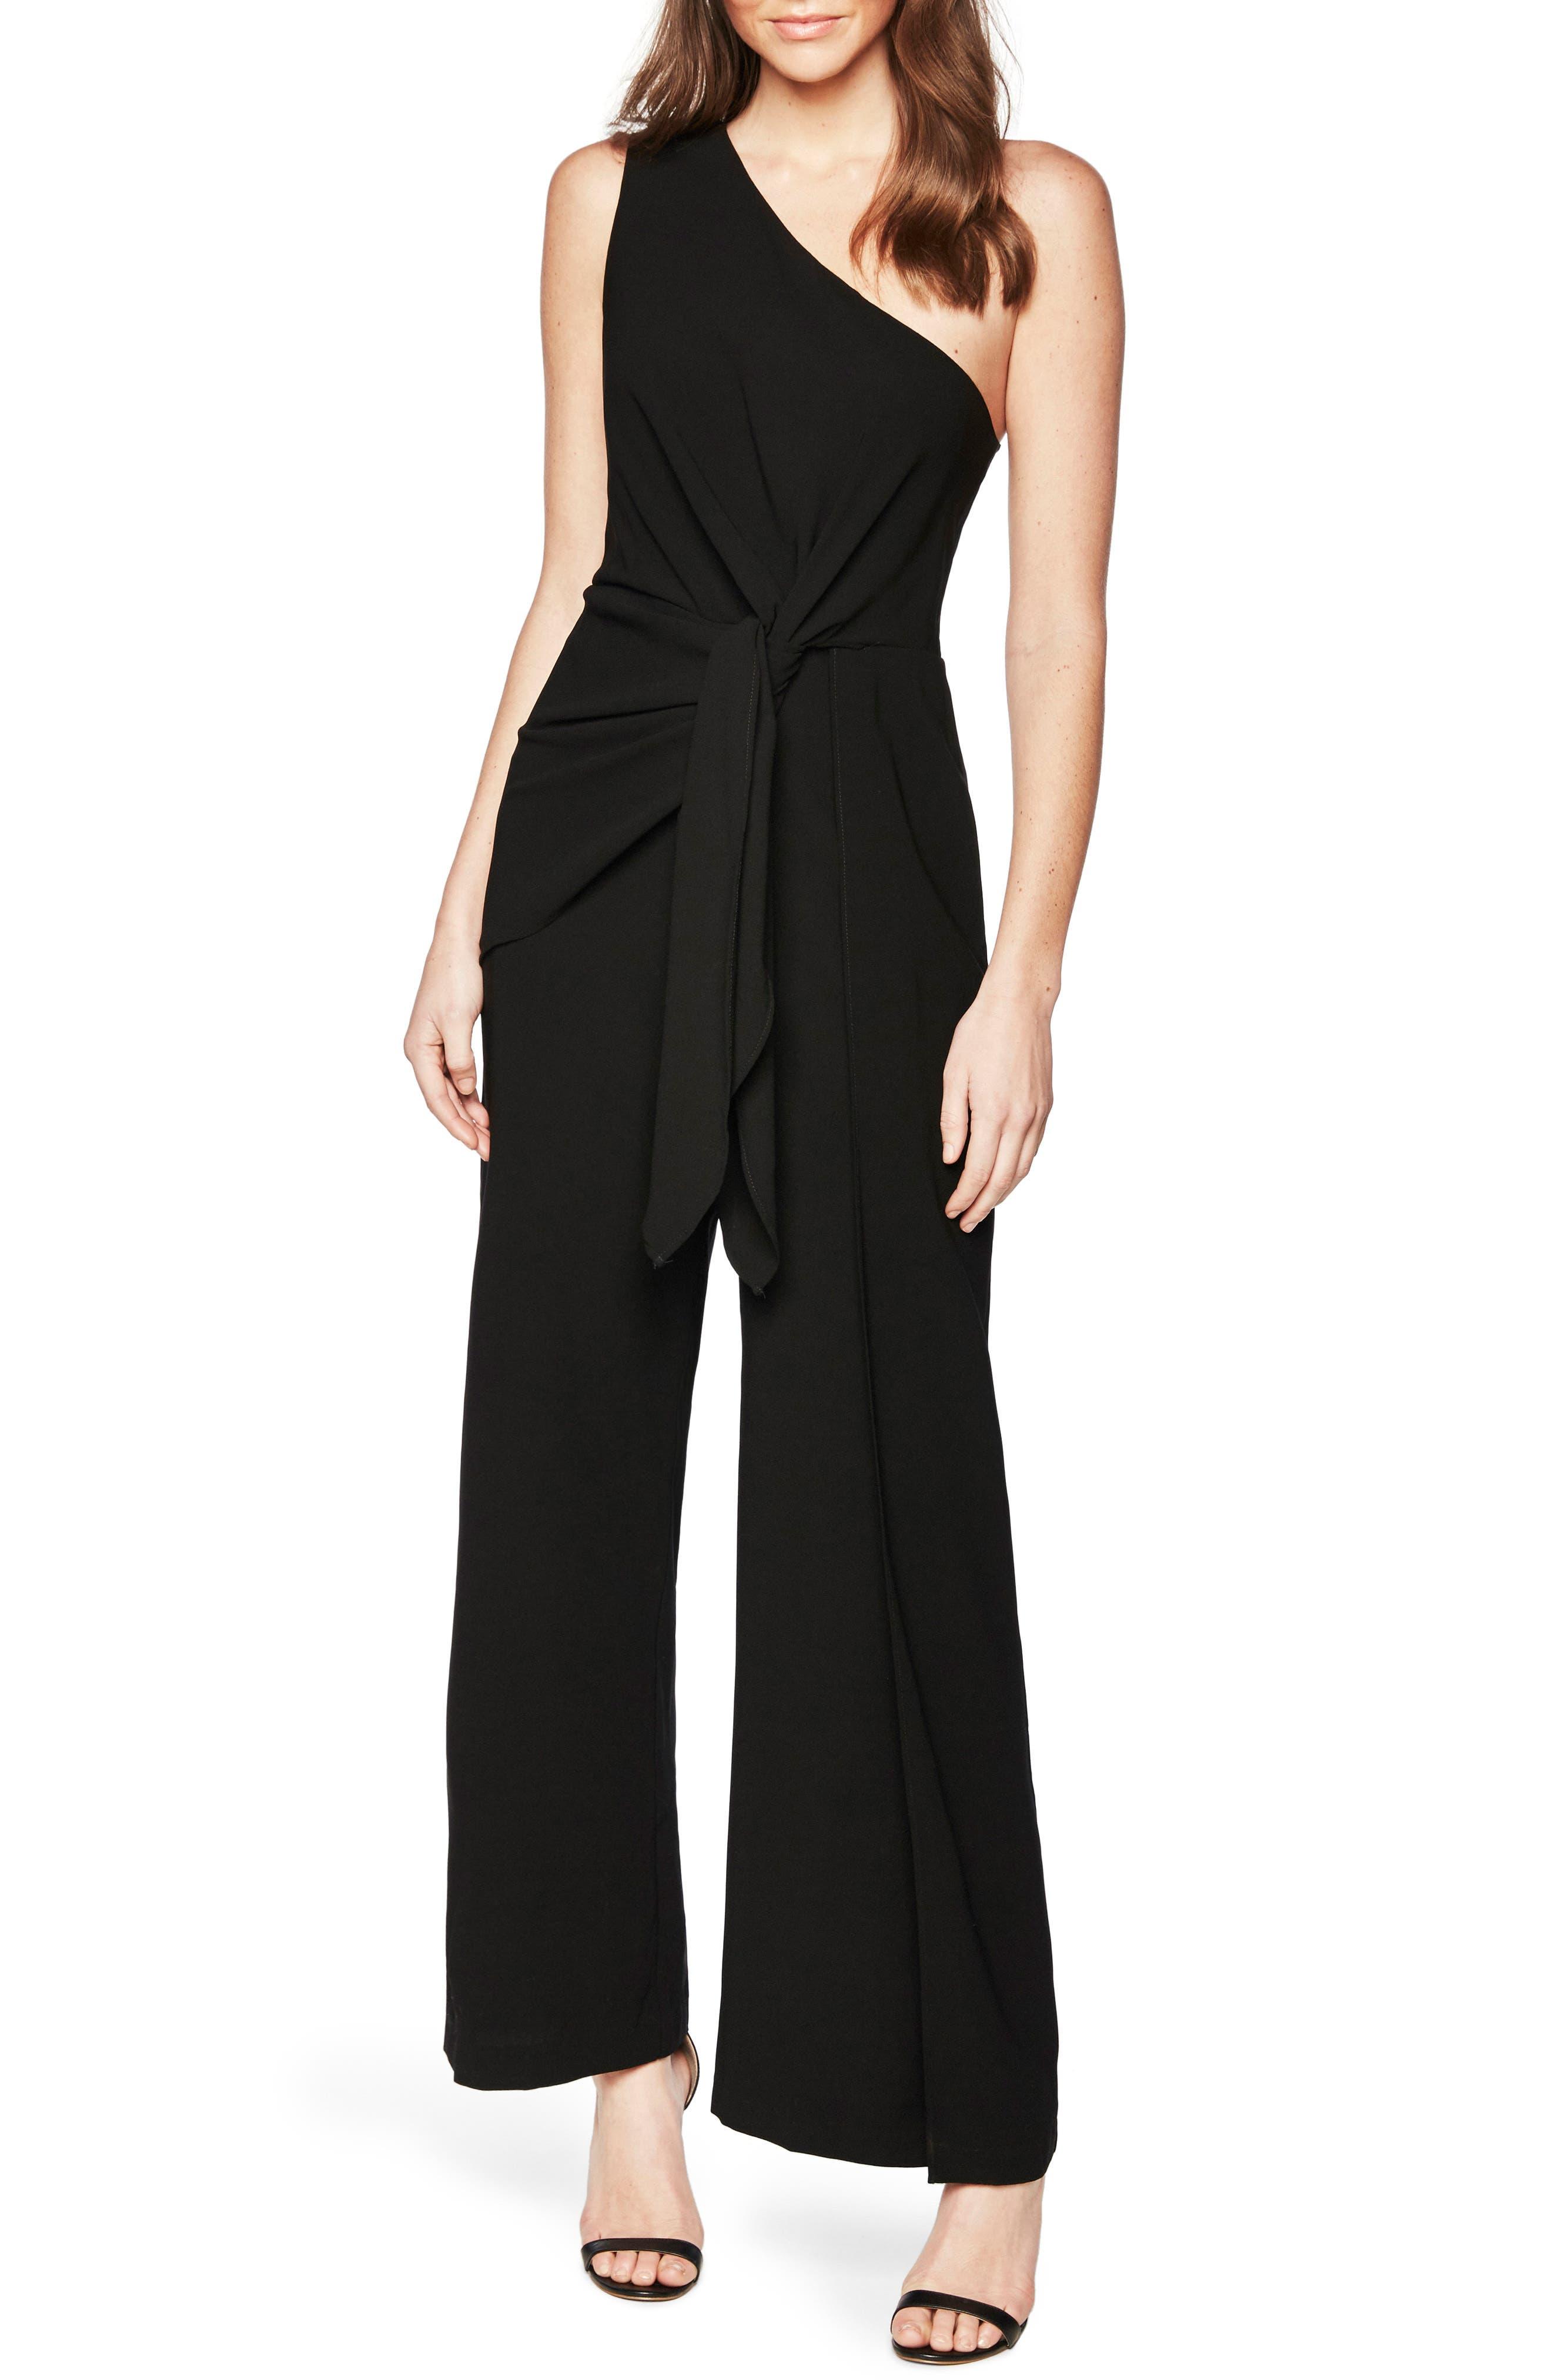 Bellini One-Shoulder Jumpsuit,                         Main,                         color, Black